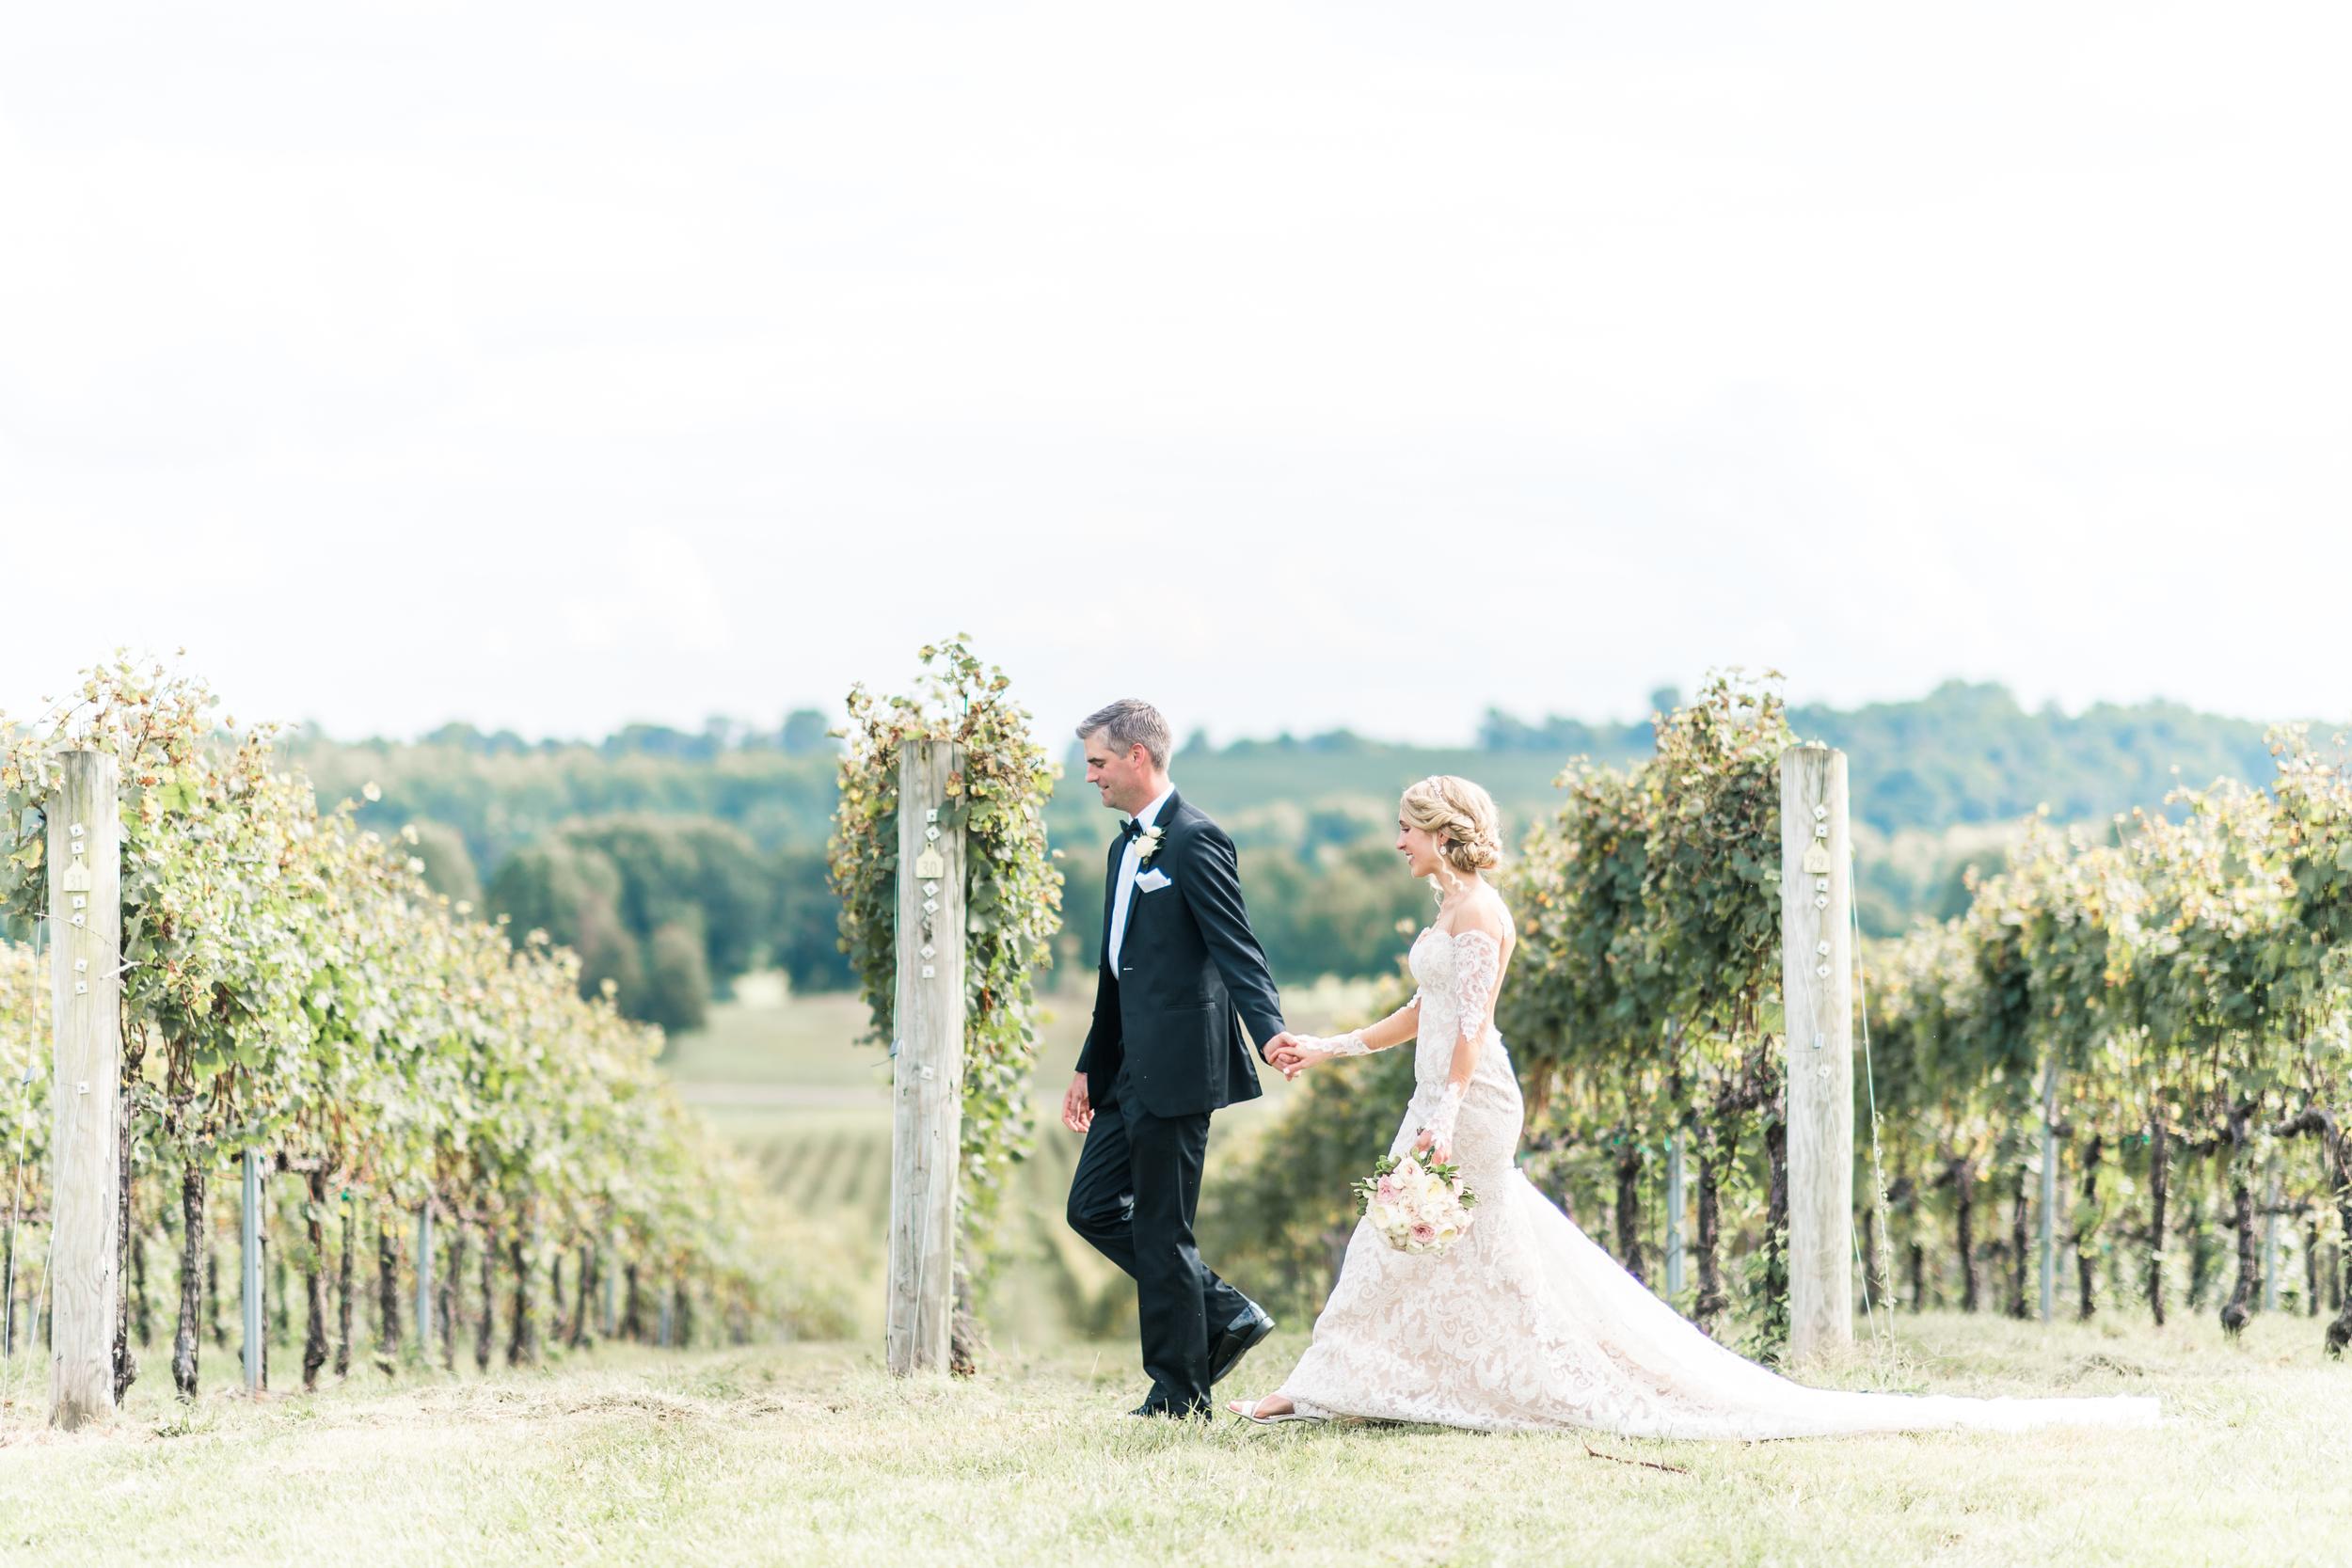 3-chris-lindsay-trump-winery-charlottesville-virginia-wedding-photographer-49.png